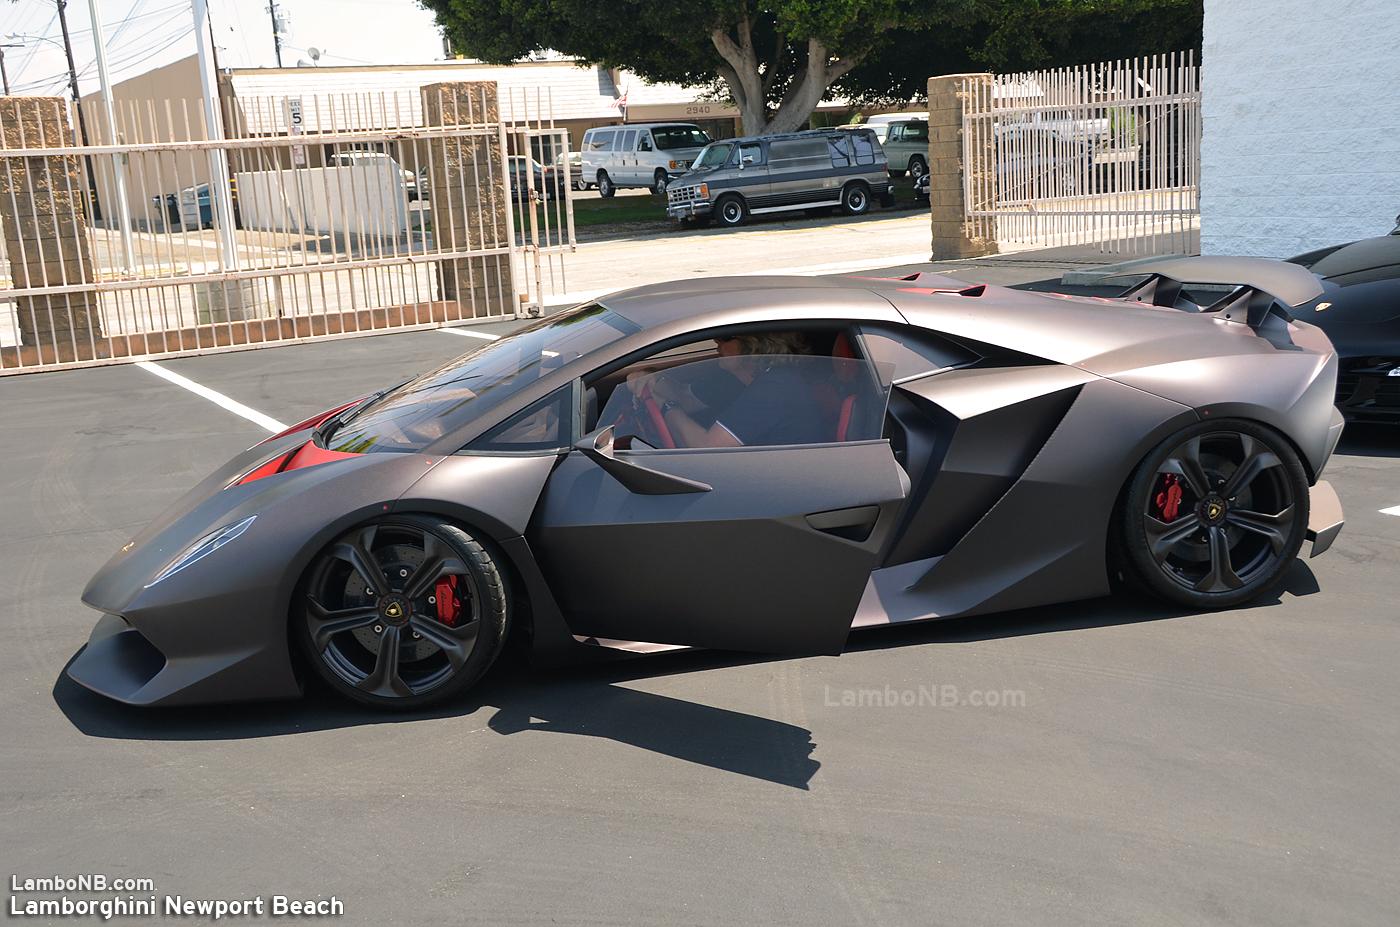 Autos Car Modification Lamborghini Sesto Elemento Cruise Ship And